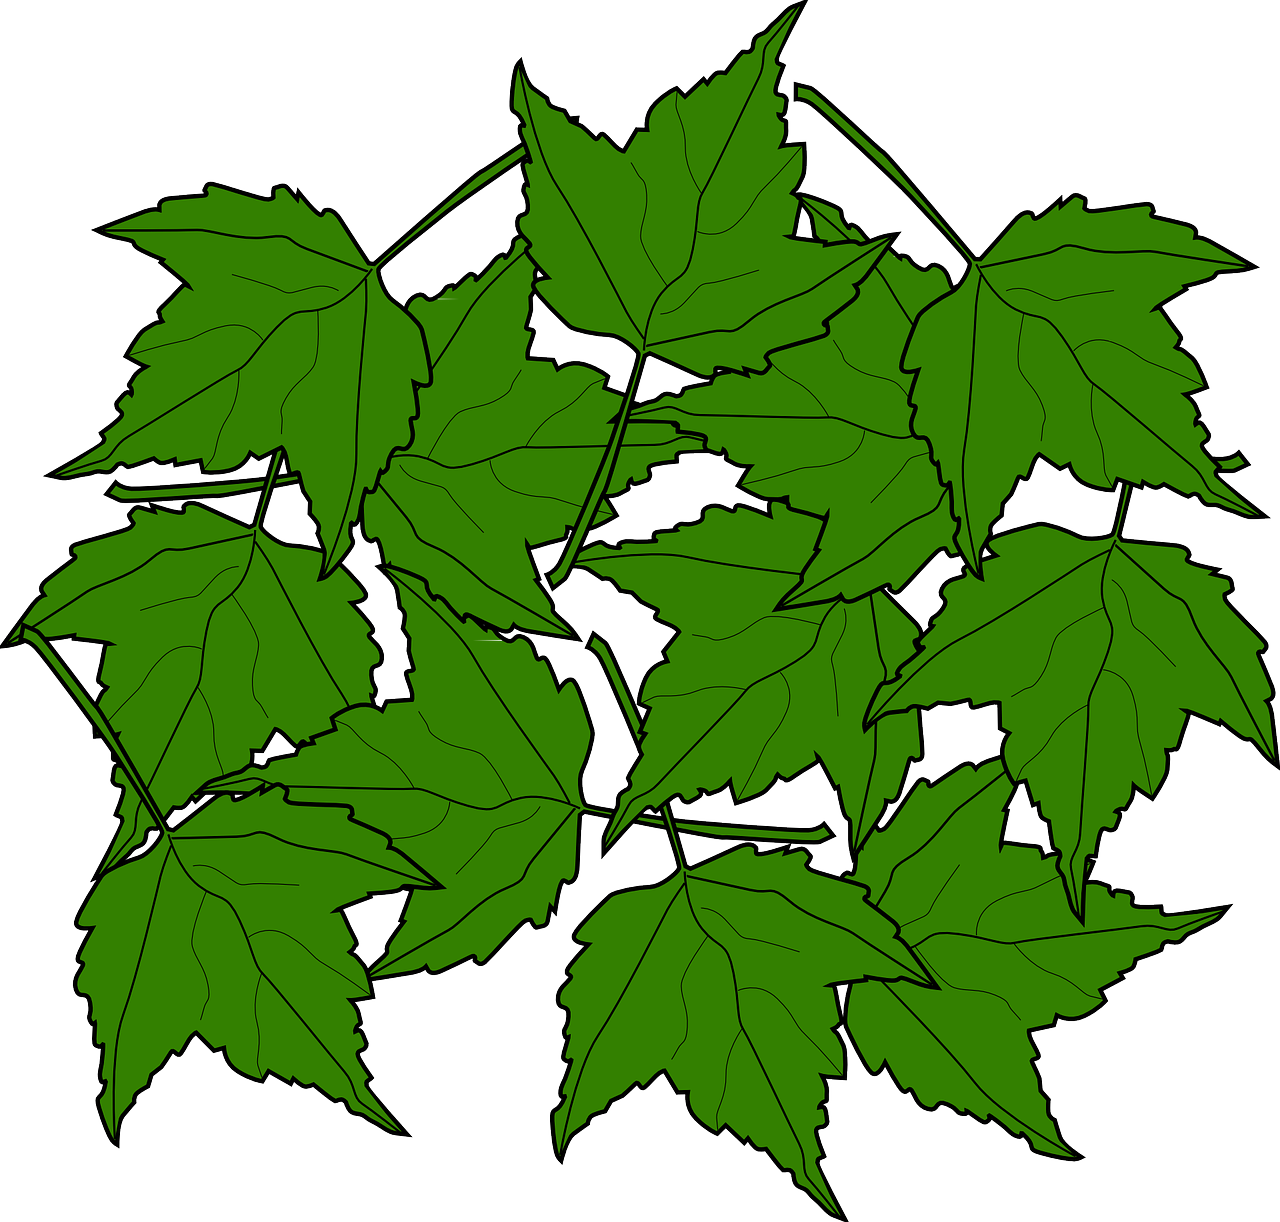 Twelve leaves